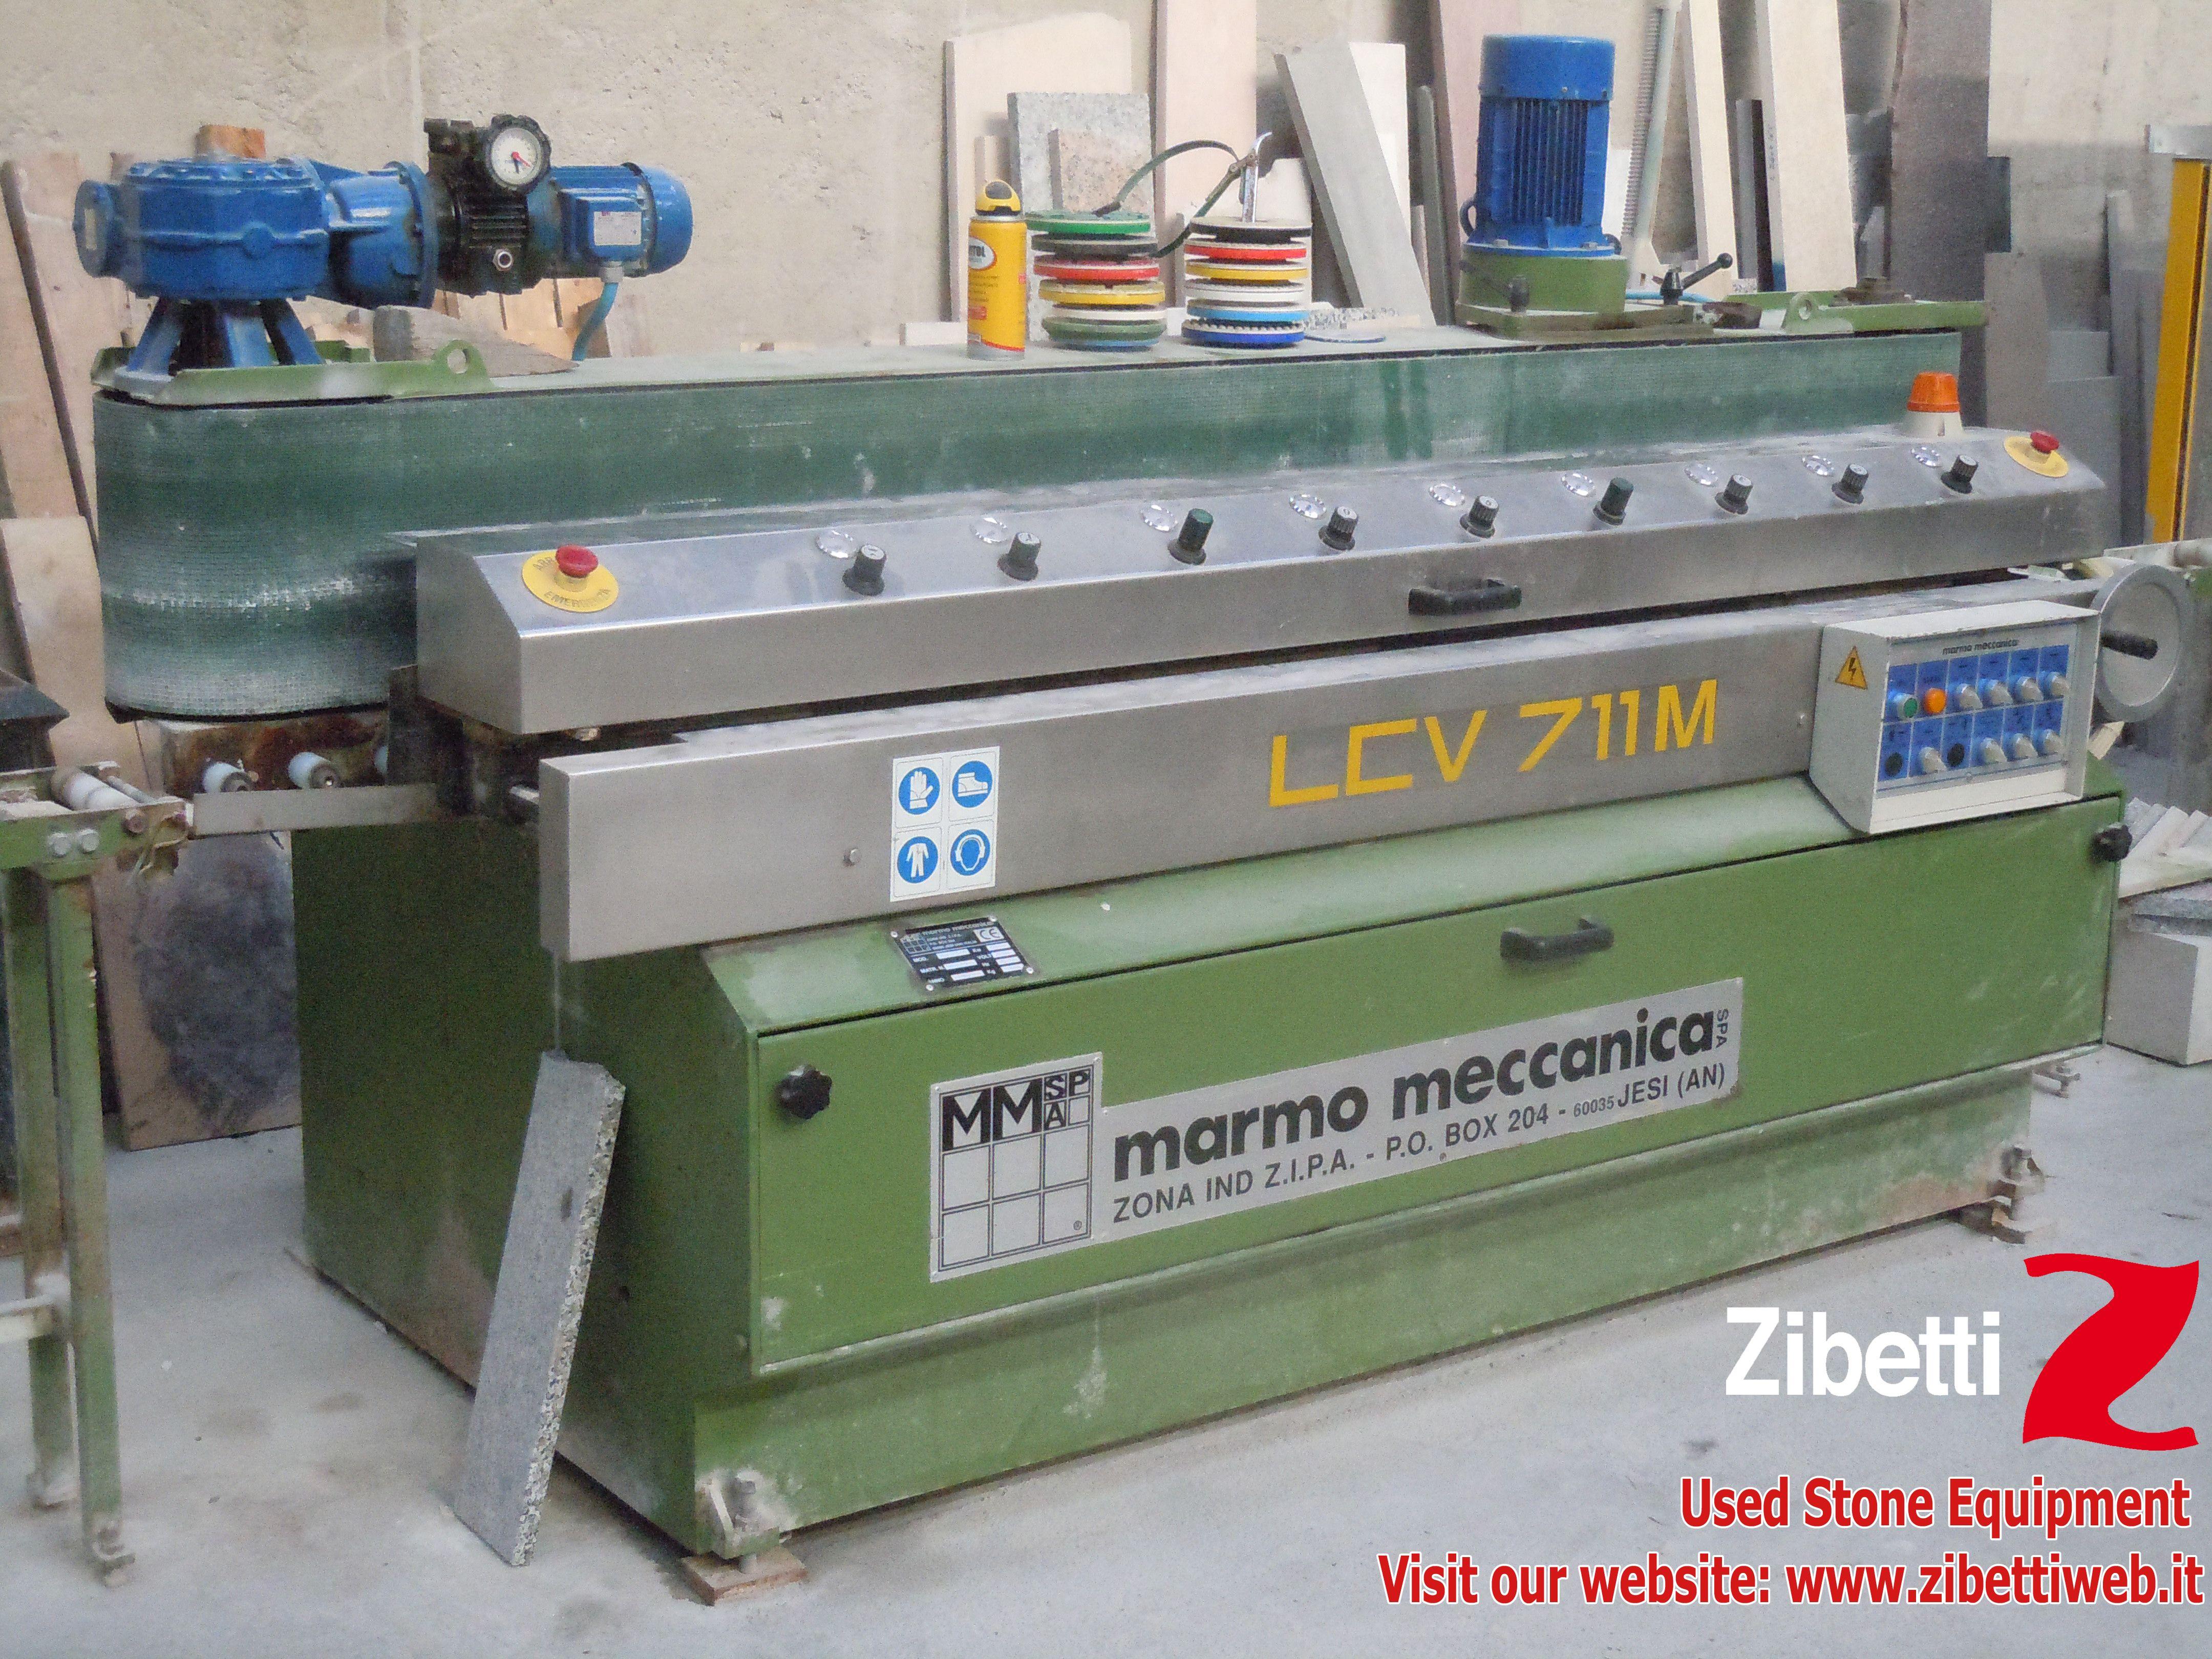 Zibetti Used Flat Edge Polishing Machine Marmo Meccanica